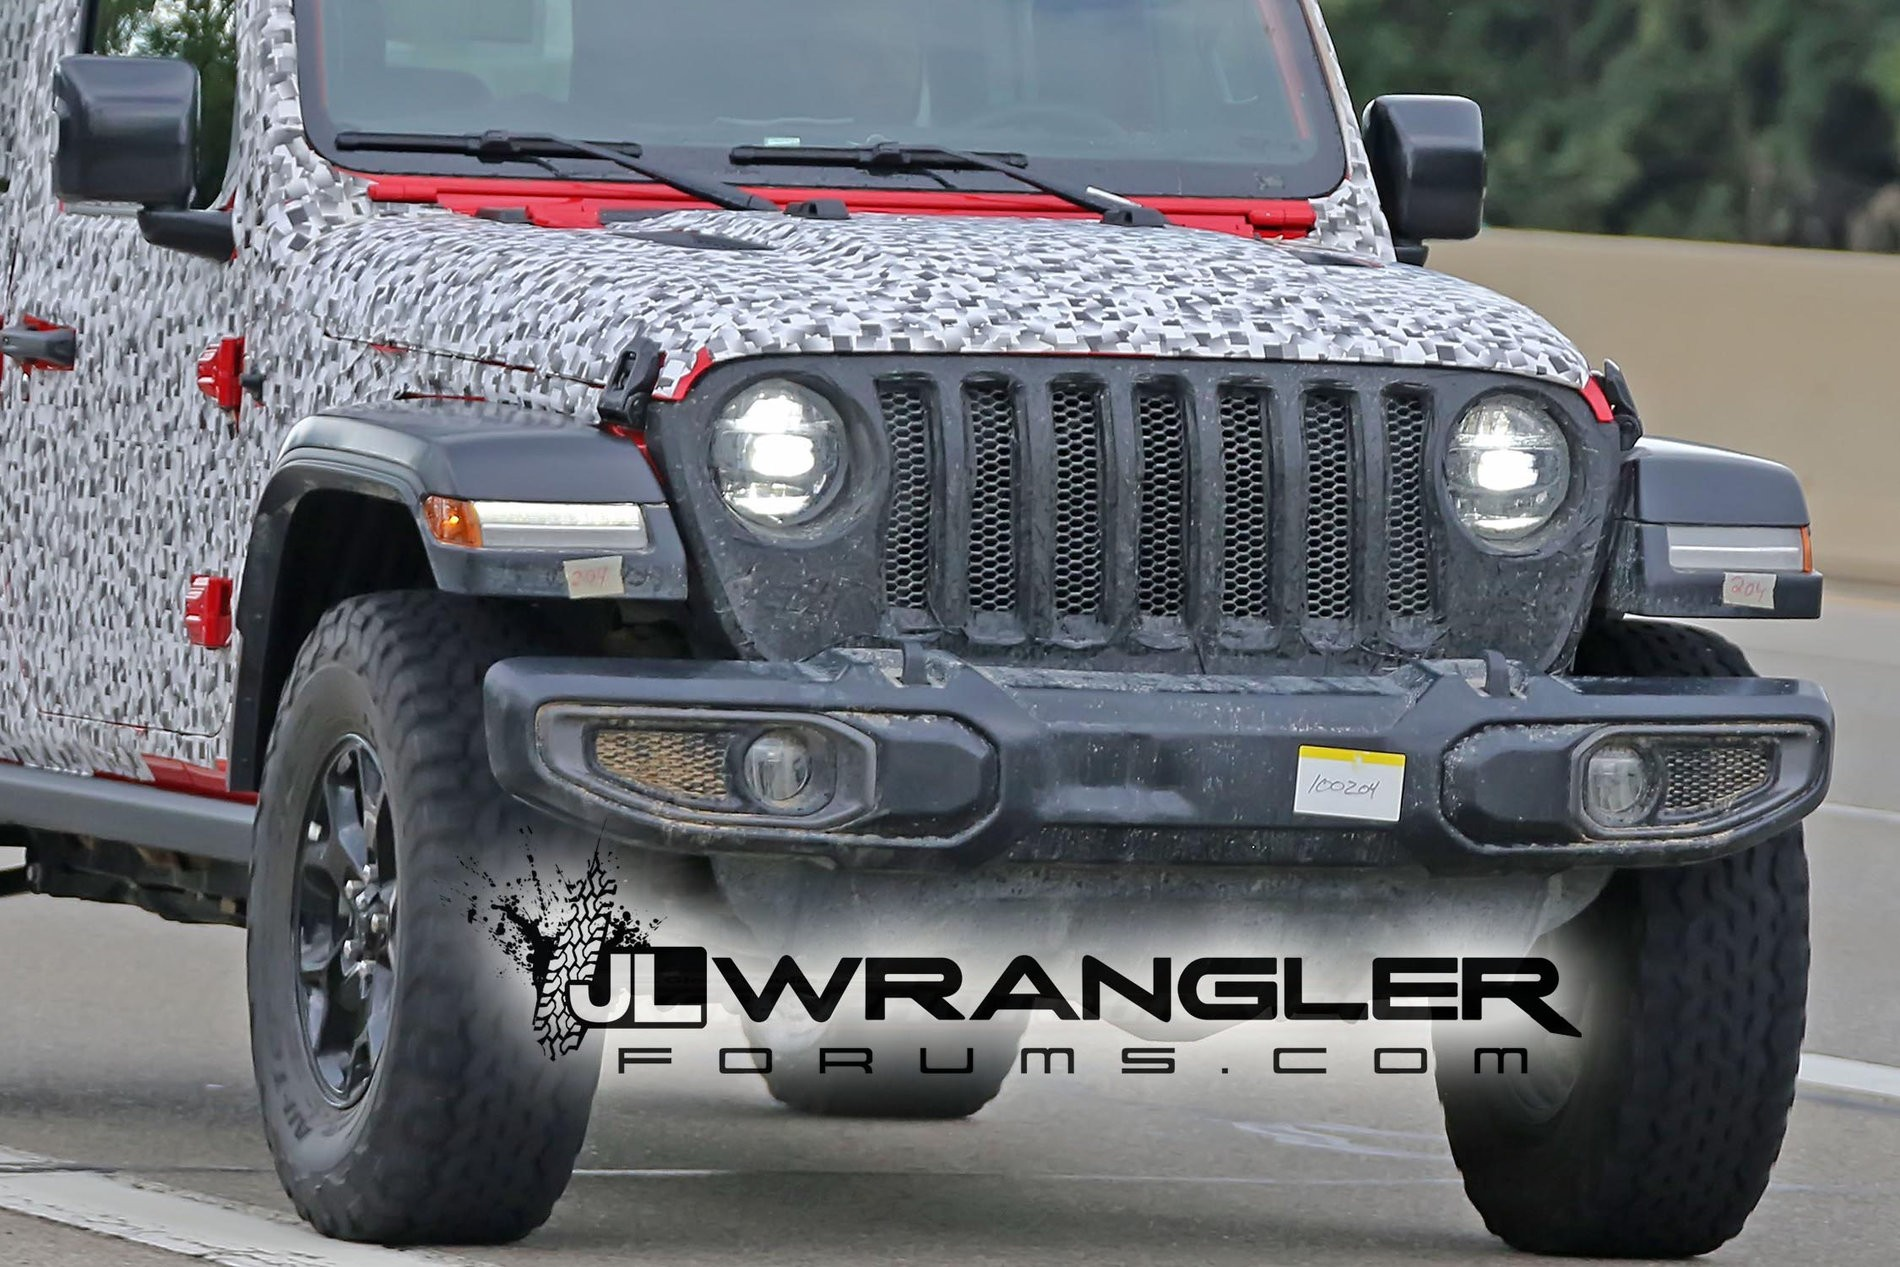 2018 JL Wrangler Uncovered JLWRANGLERFORUMS 2